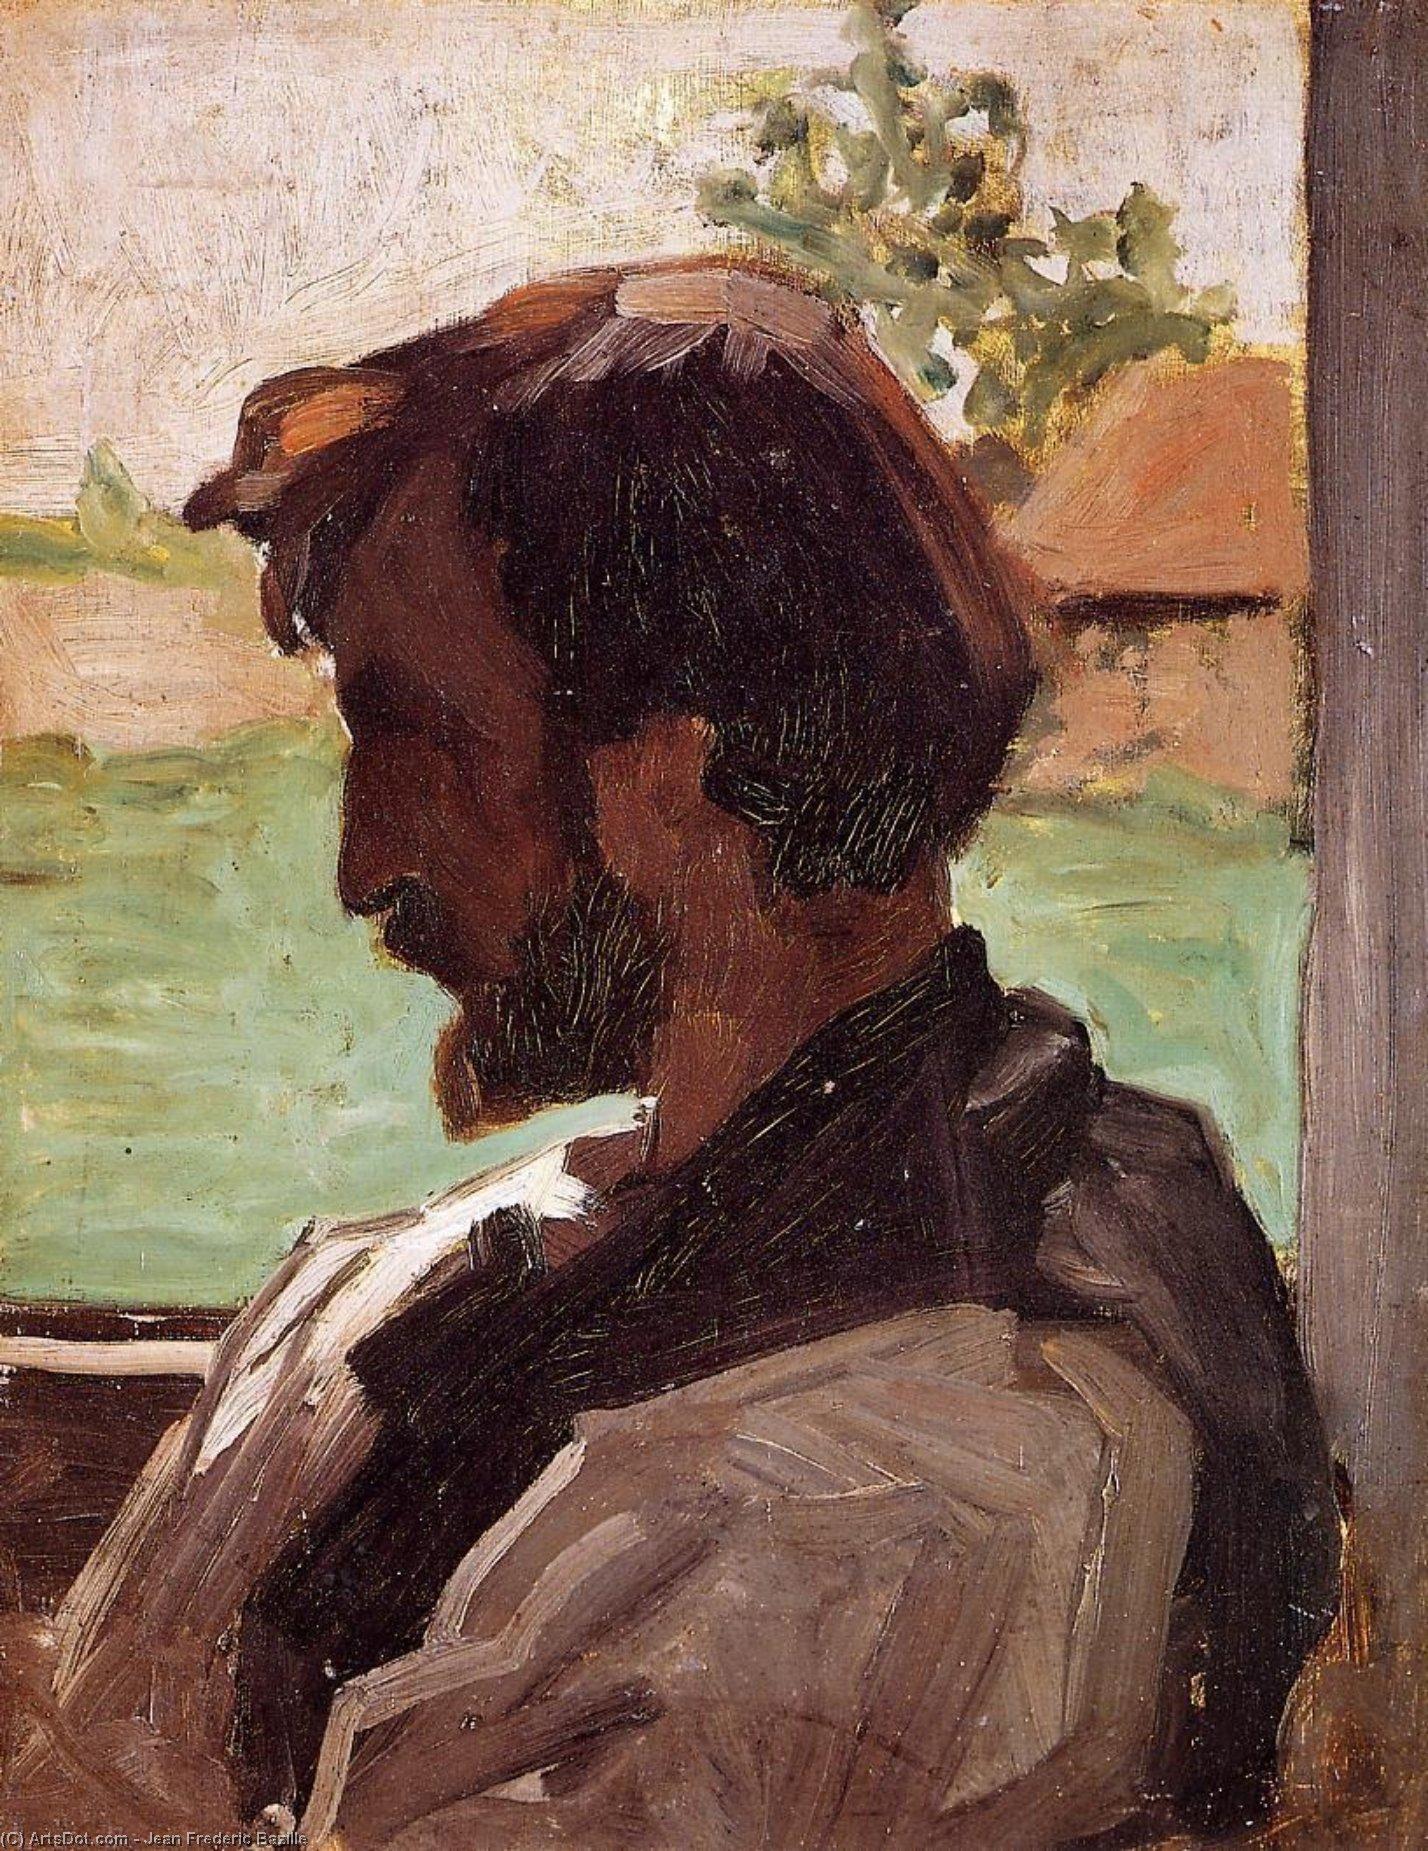 Wikioo.org - สารานุกรมวิจิตรศิลป์ - จิตรกรรม Jean Frederic Bazille - Self Portrait at Saint-Sauveur